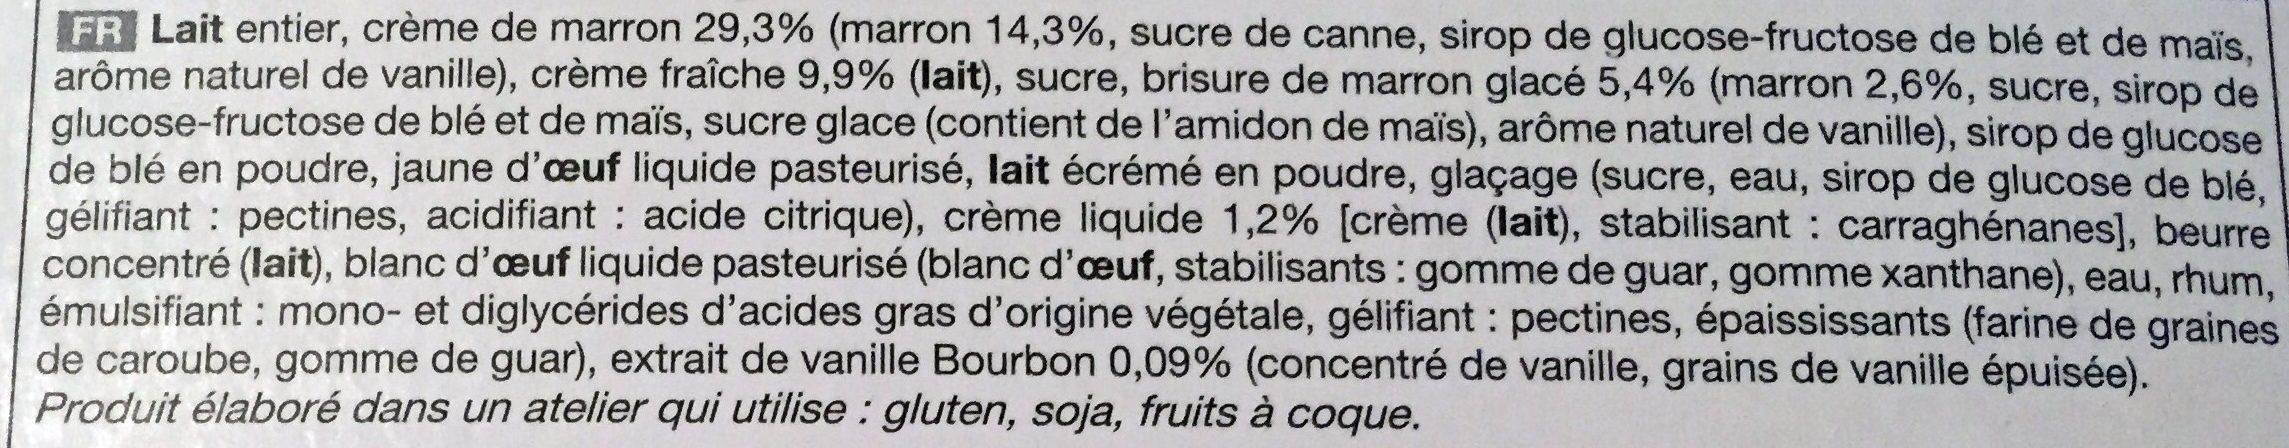 Bûche glacée marron-vanille - Ingredientes - fr